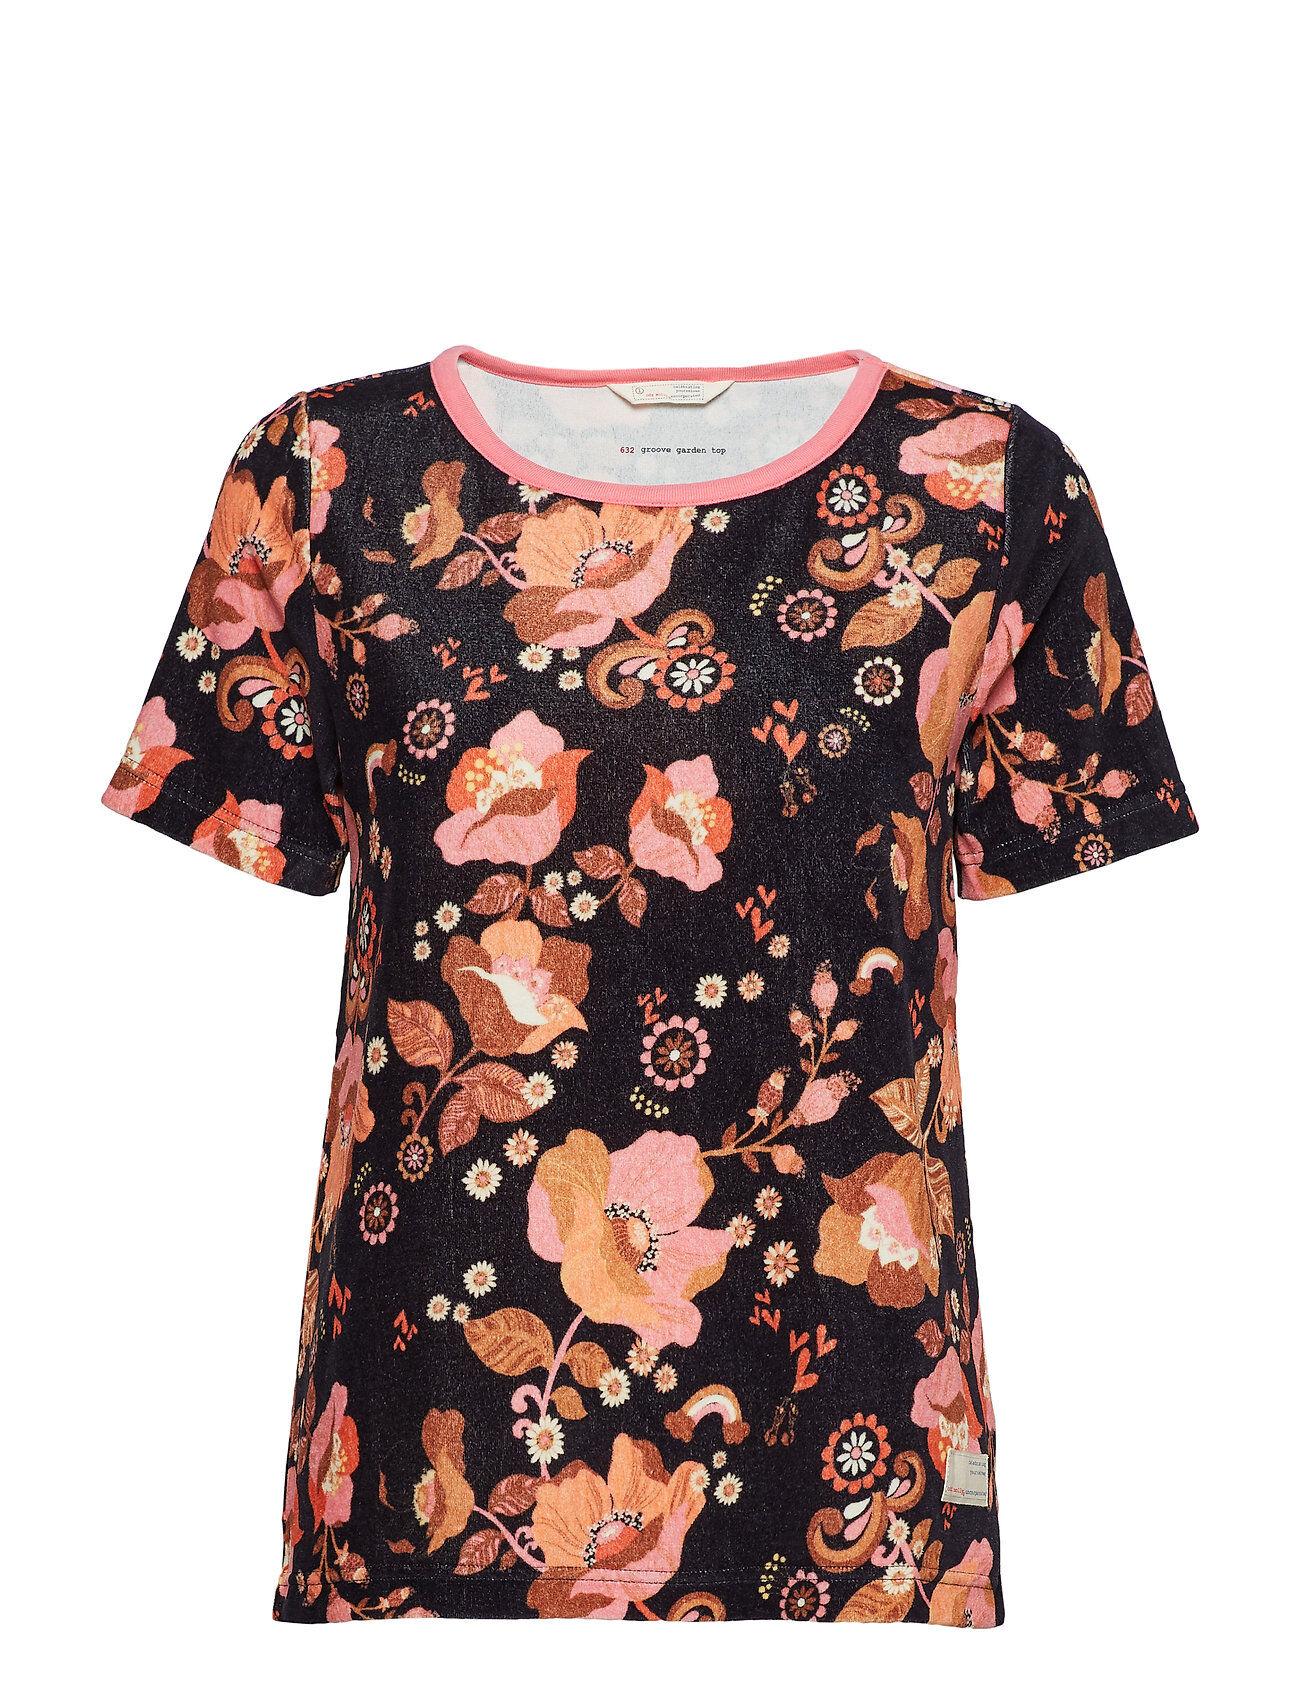 Image of ODD MOLLY Groove Garden Top T-shirts & Tops Short-sleeved Musta ODD MOLLY